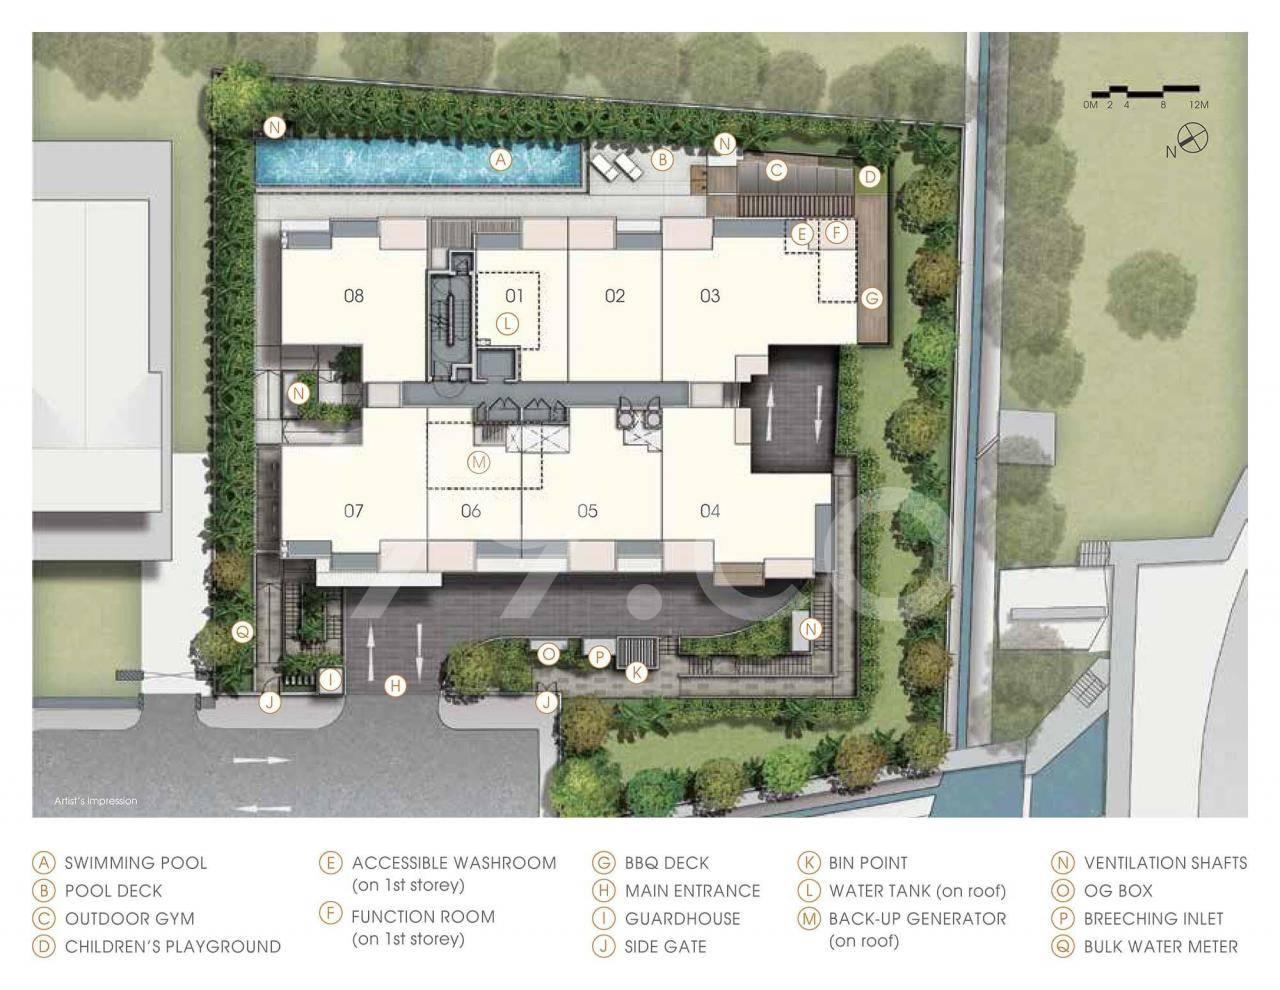 Jervois Treasures site plan